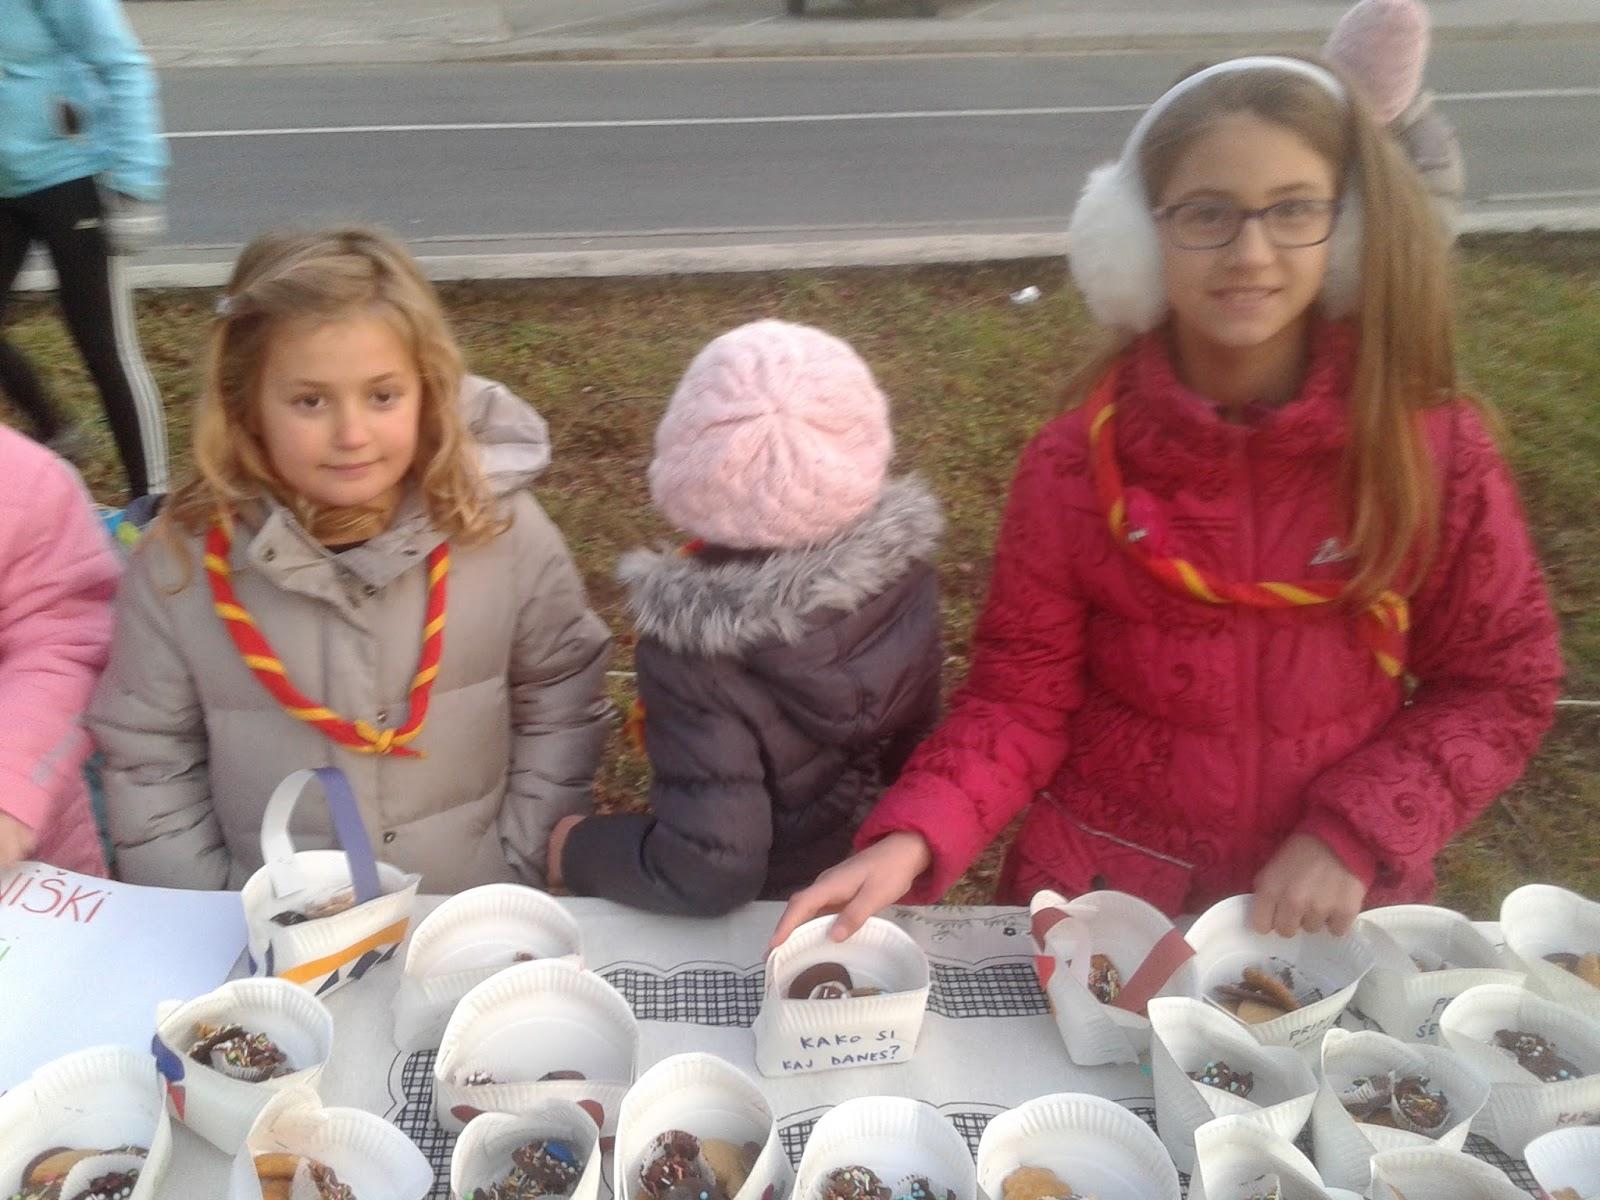 MČ pekarija, Ilirska Bistrica, 10. in 12. december - 20151212_162032.jpg